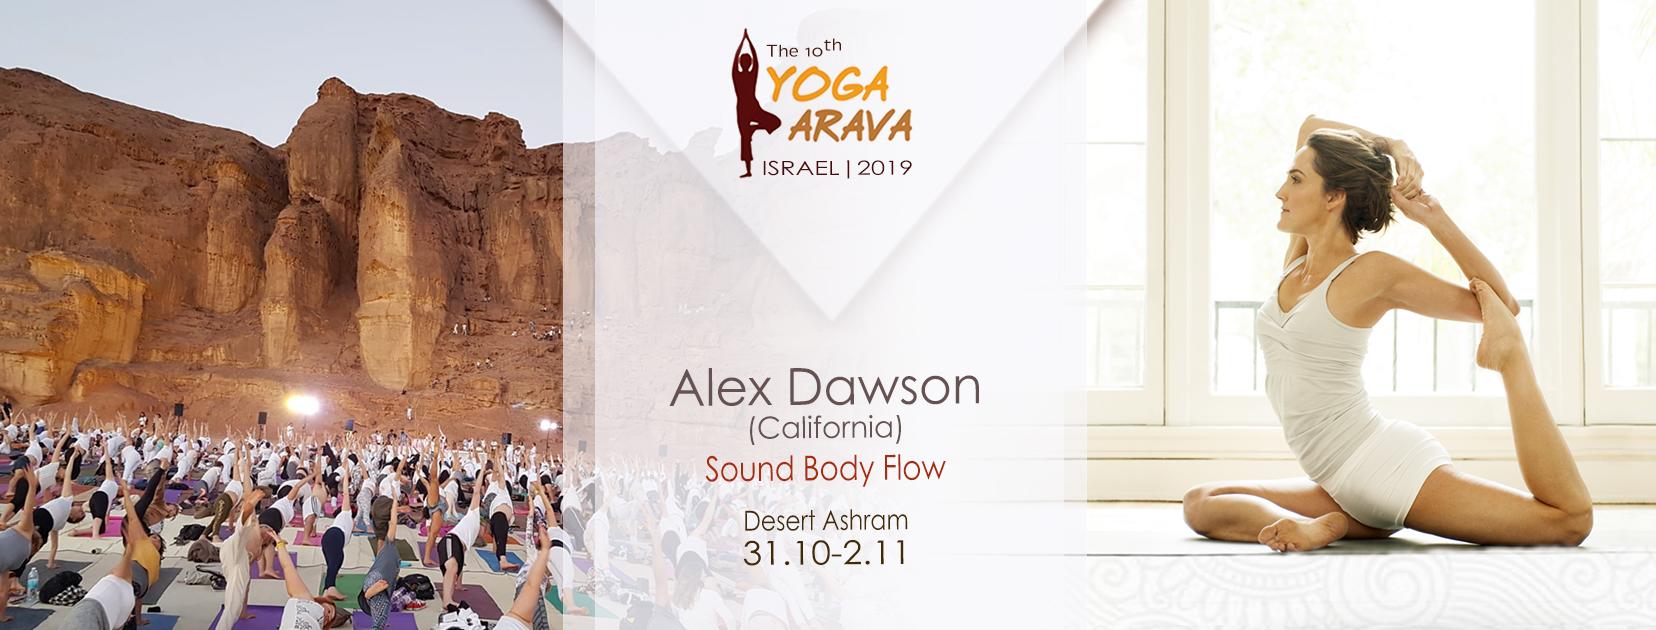 yoga-arava_cover_2019_Alex.jpg